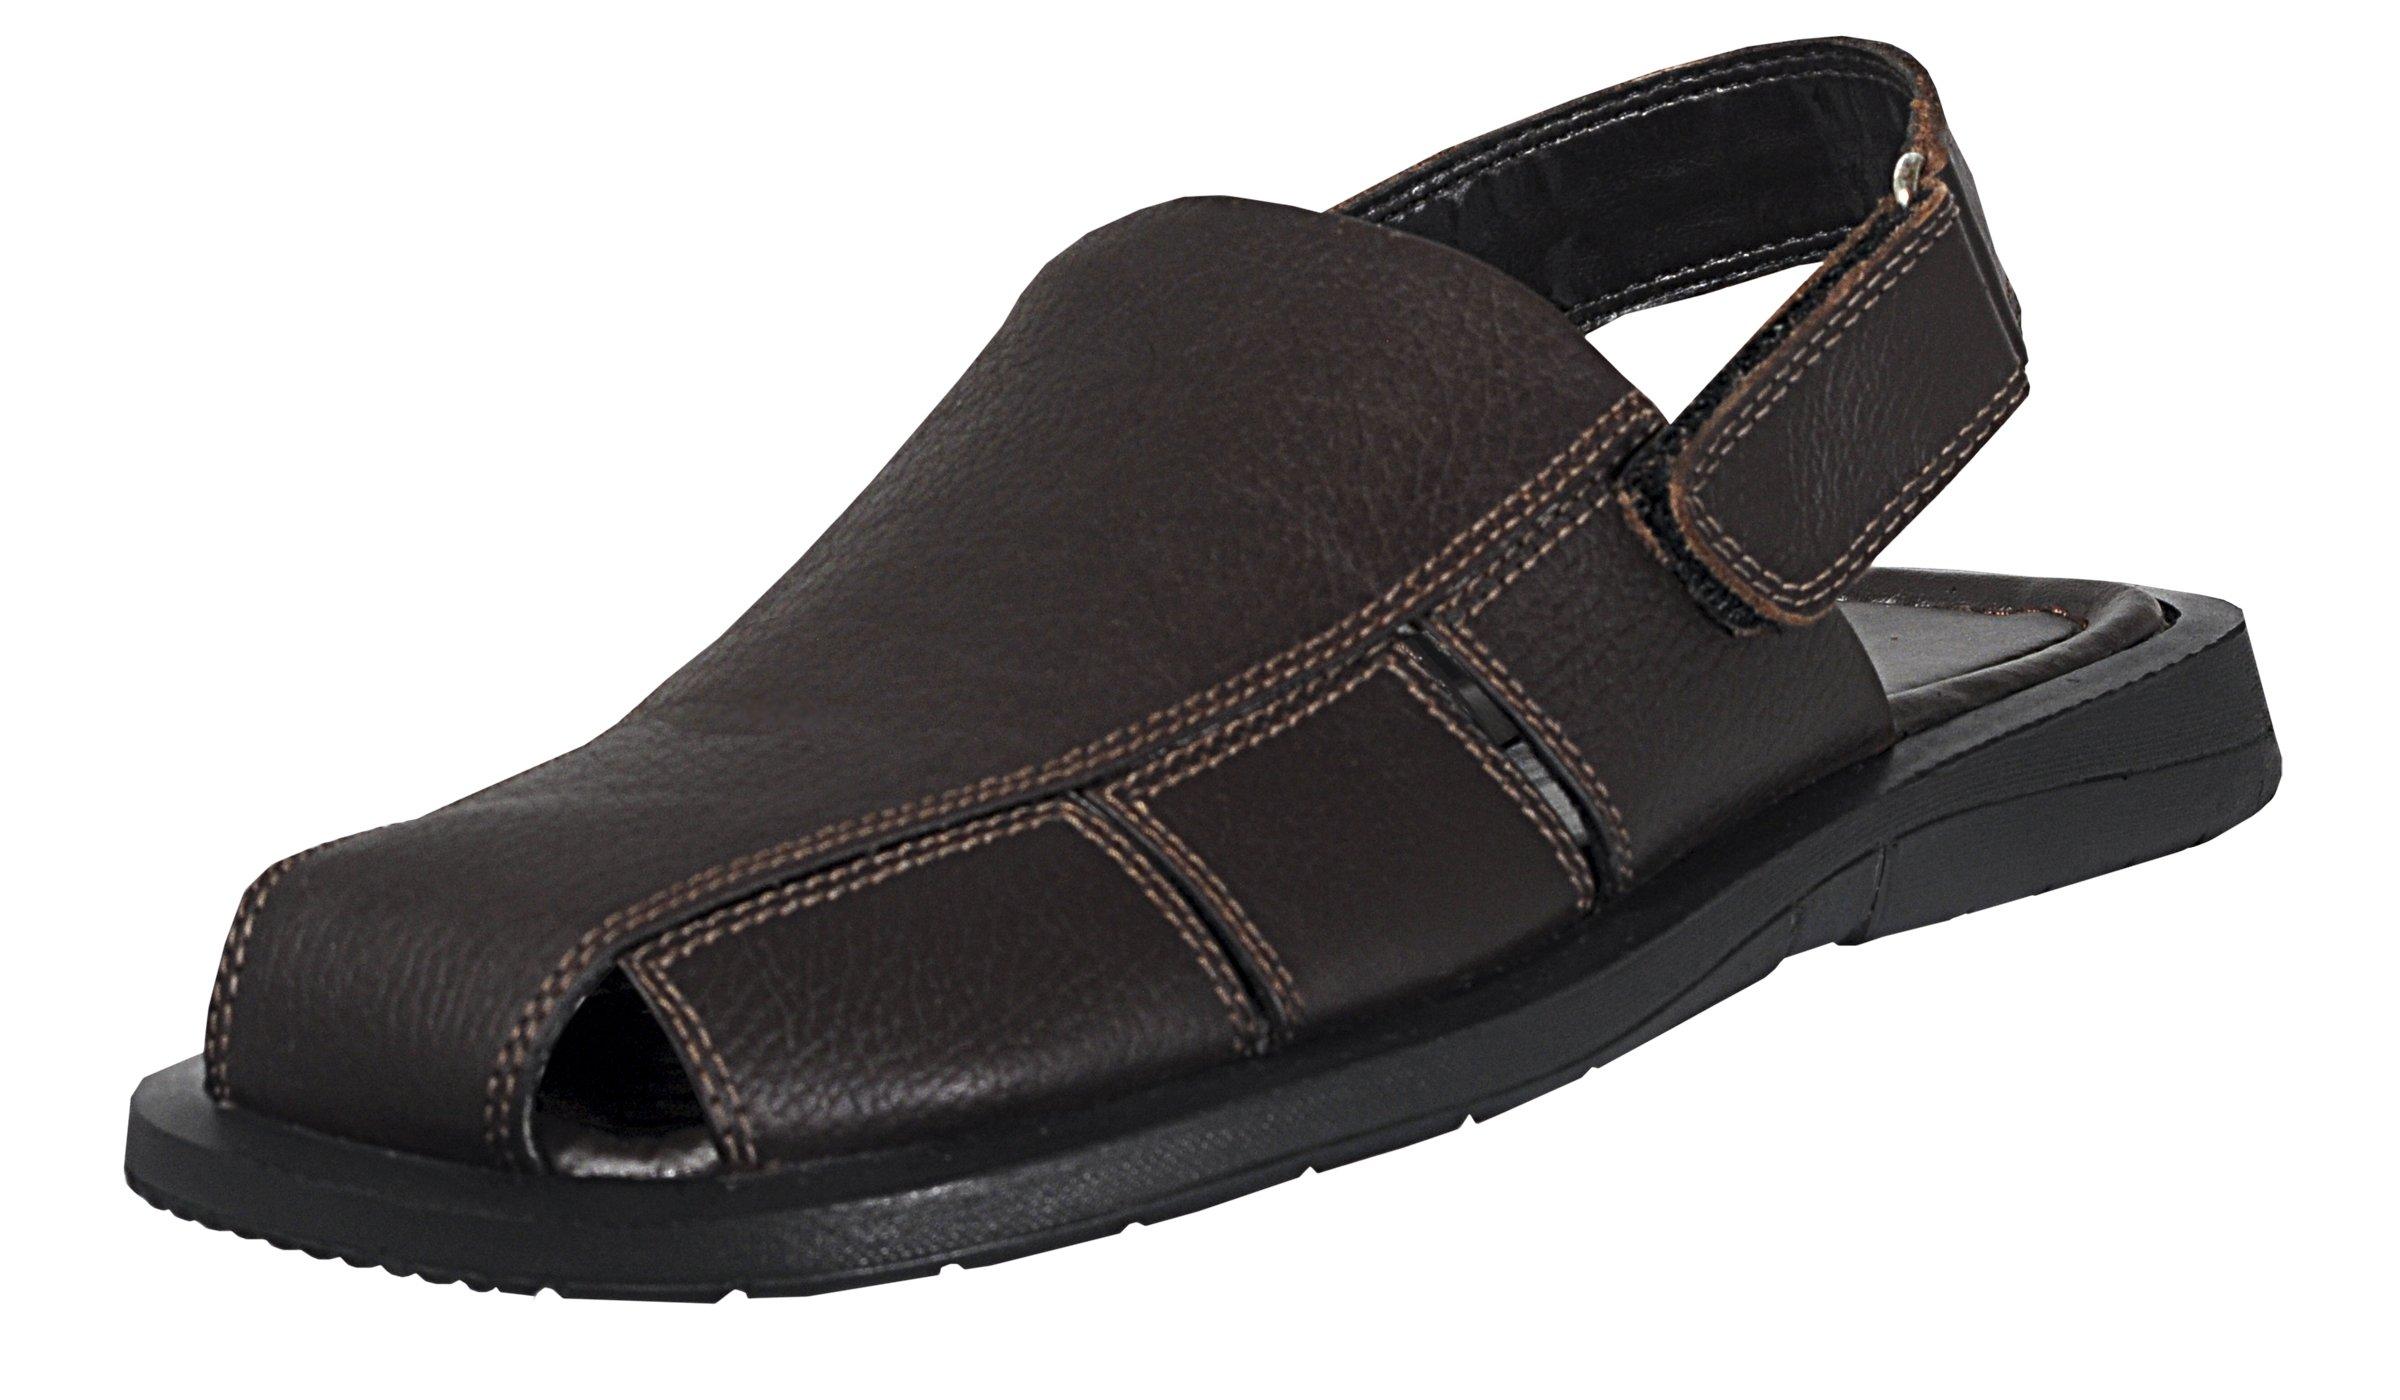 Mario Pellino Mens Casual Sandals Handmade Genuine Leather Sandals For Mens (40 M EU/8-8.5 B(M) US, Brown)